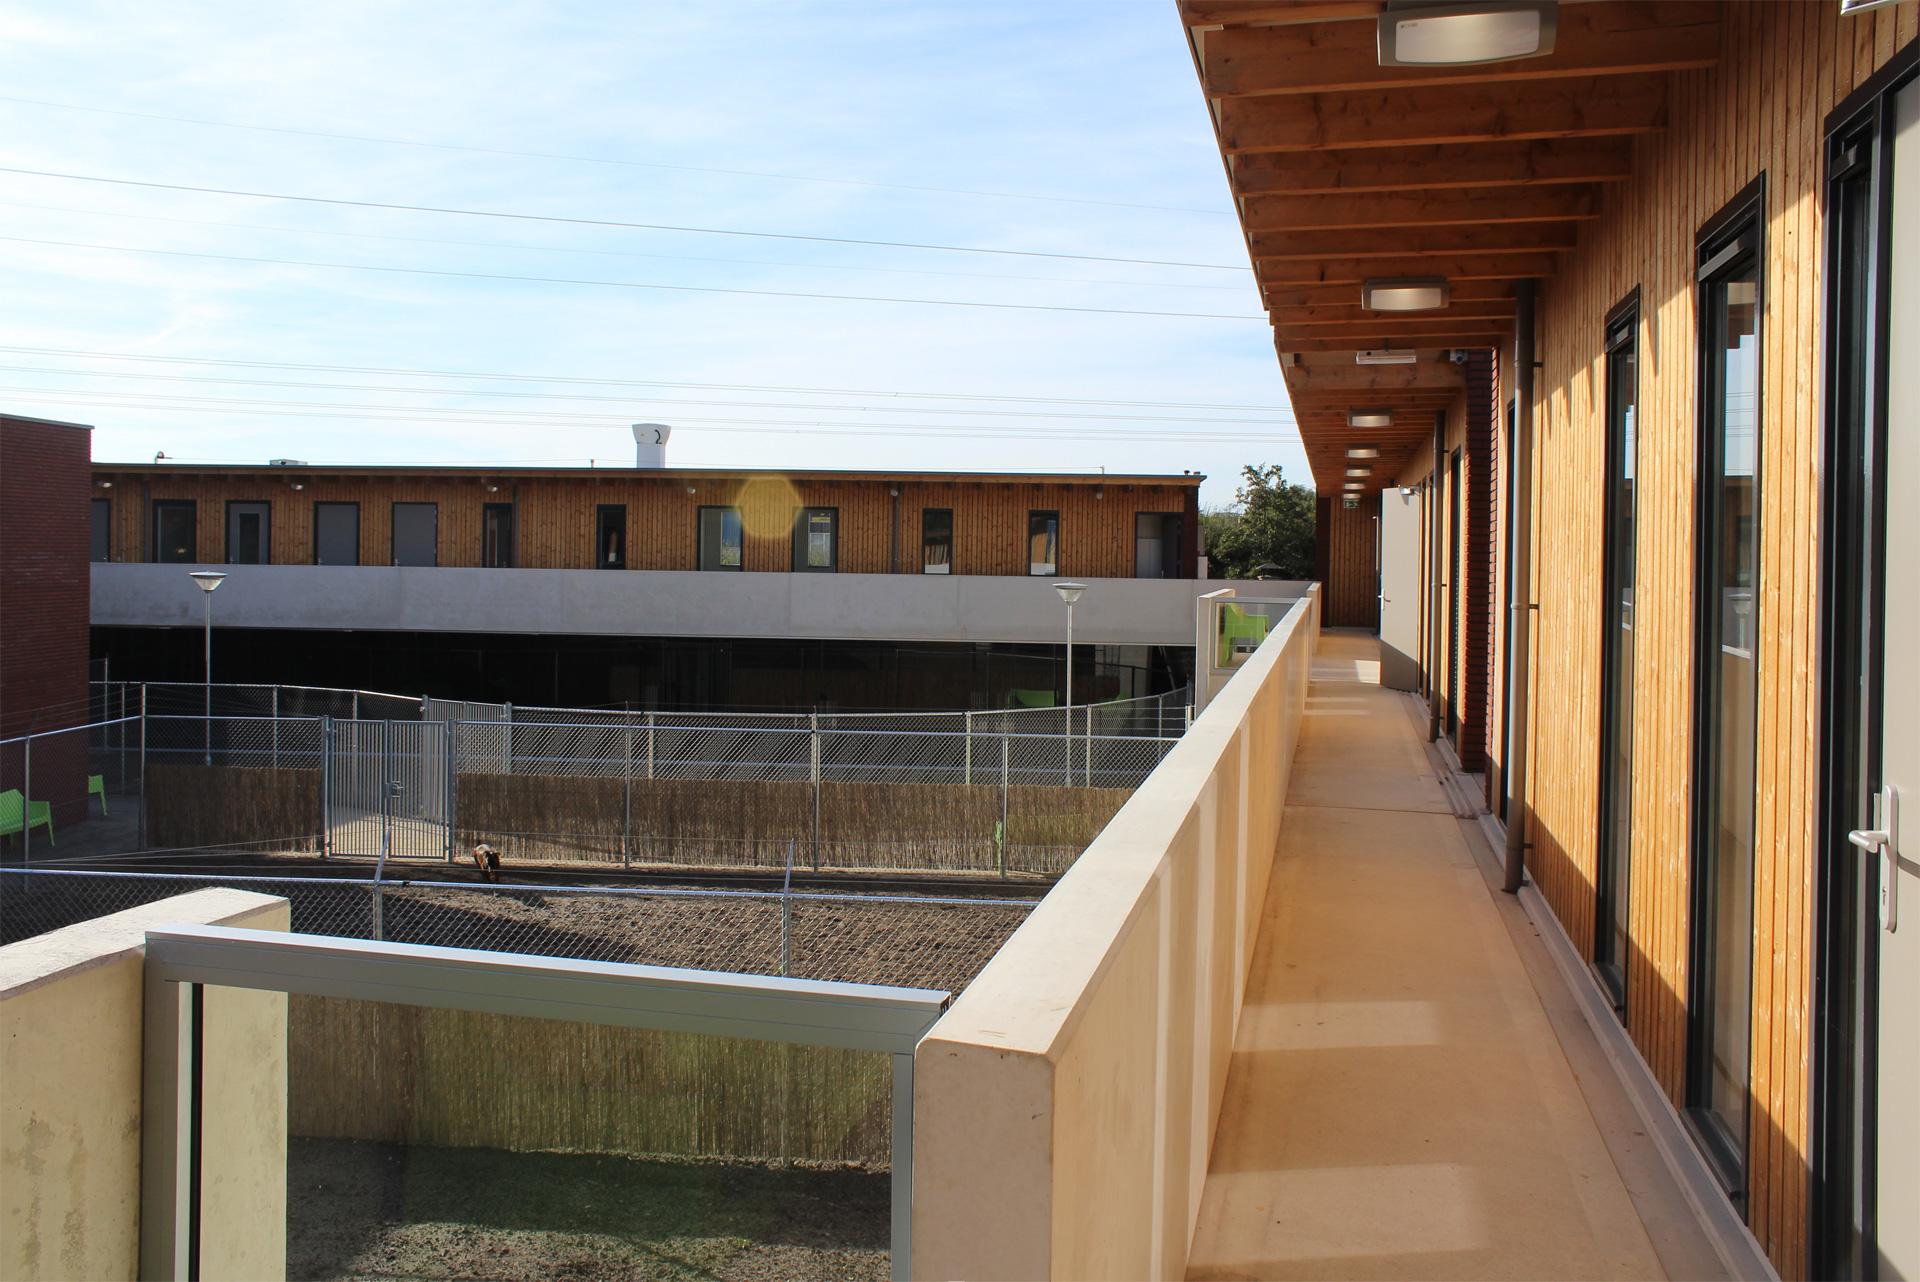 nieuwbouw-dierenasiel-houten-gevelbekleding-2